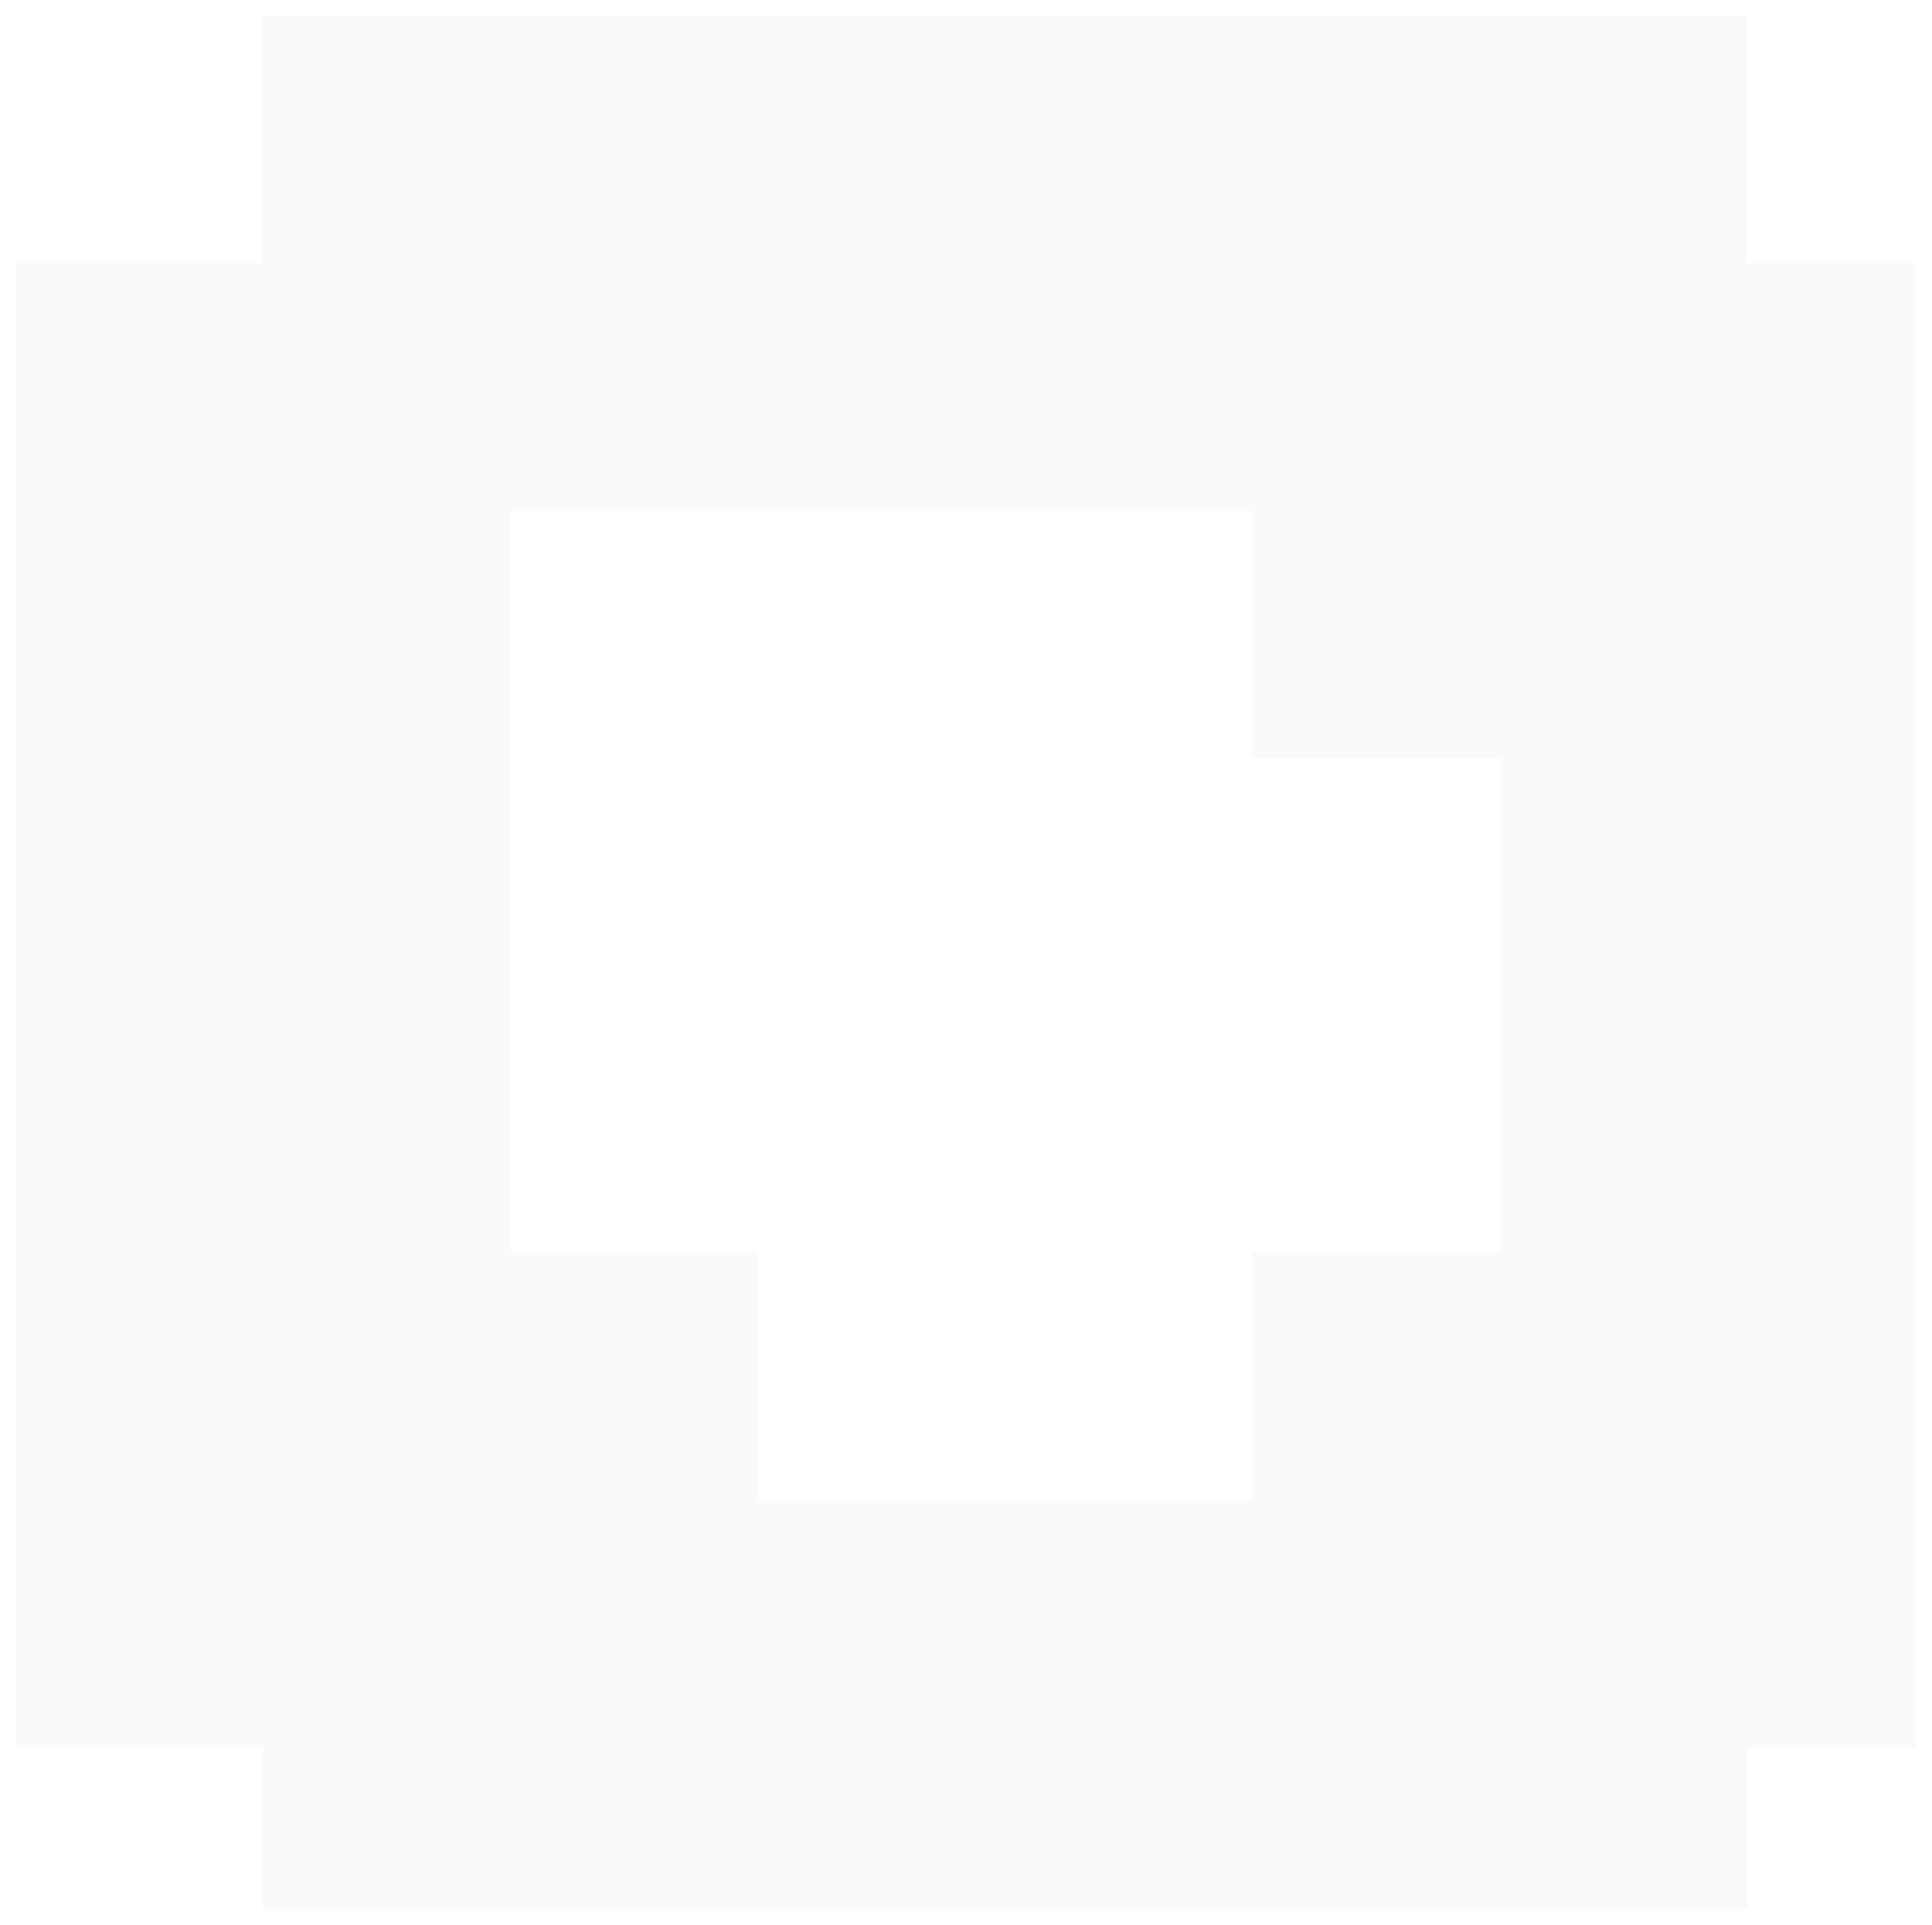 Oval clipart lace. Border frame transparent png